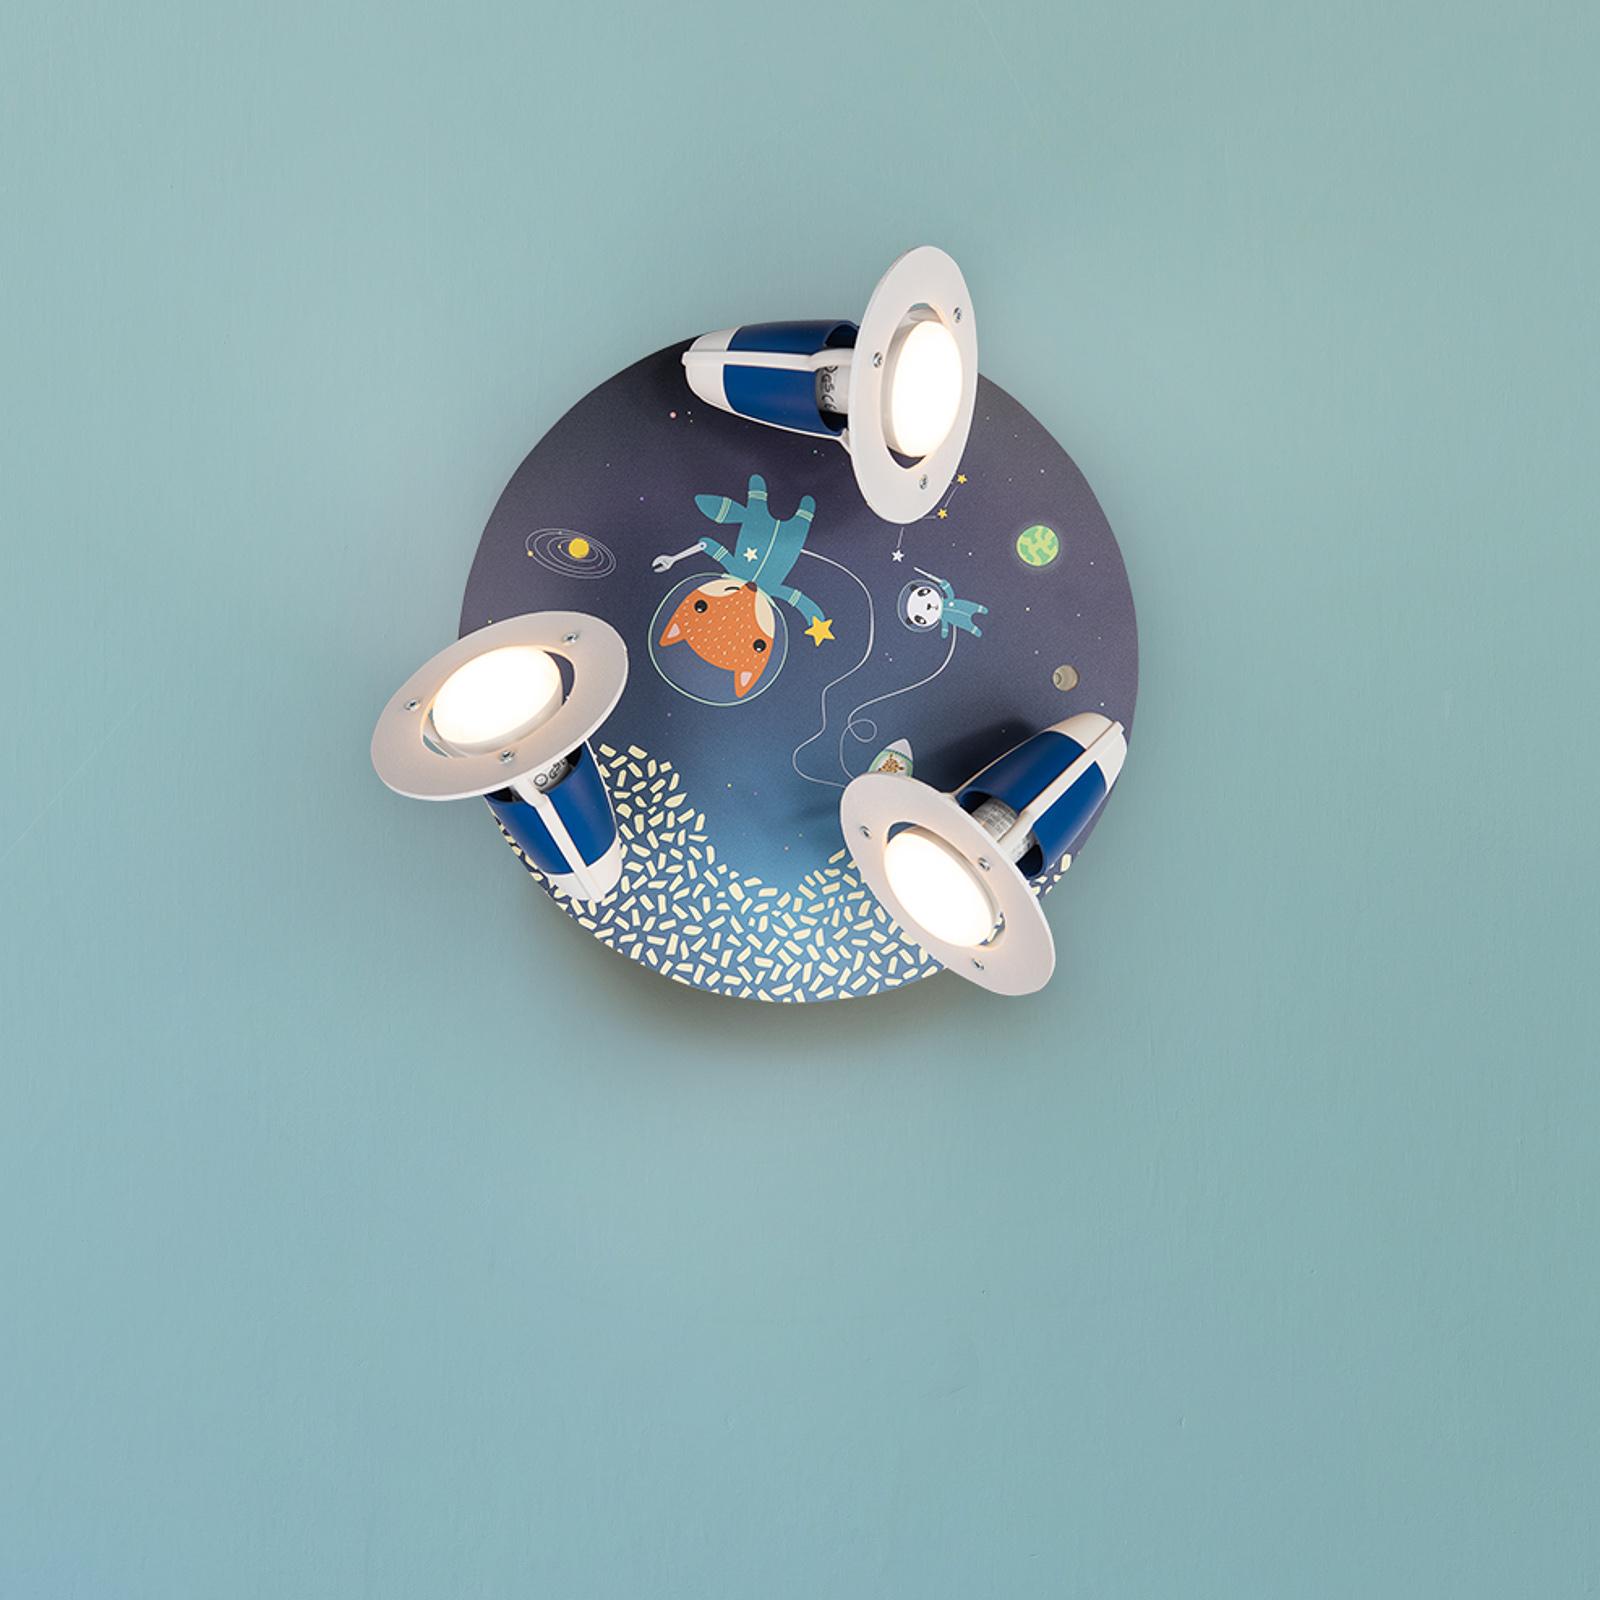 Plafondlamp Rondell Space Mission, blauw